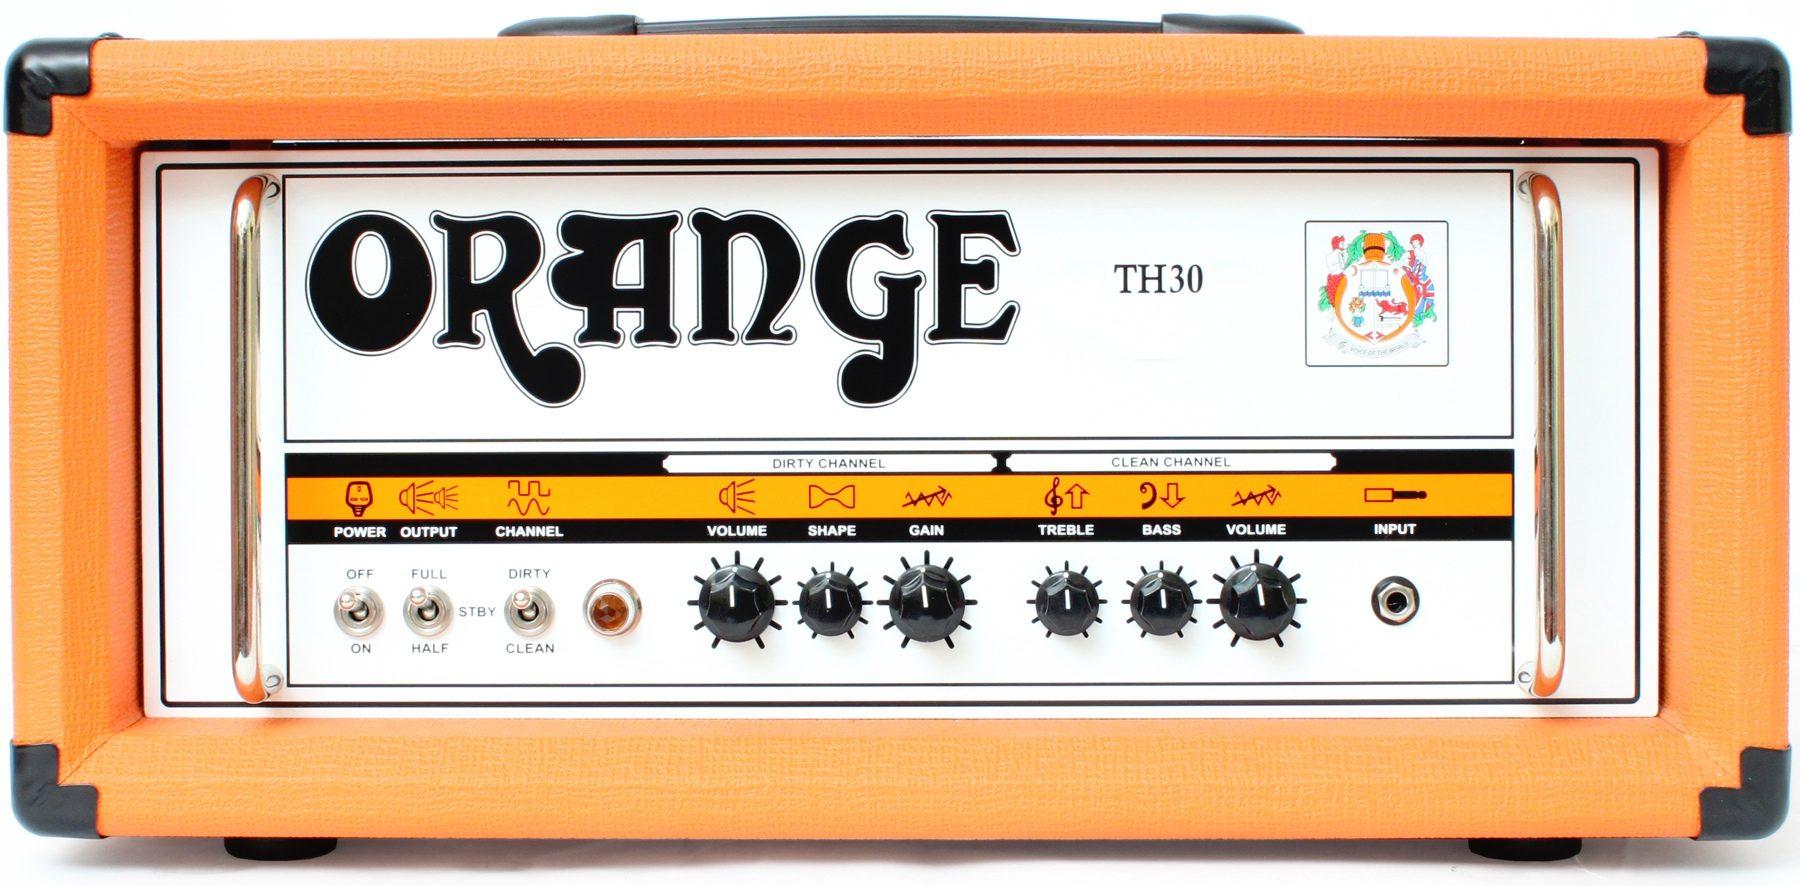 Orange TH30 amplifier